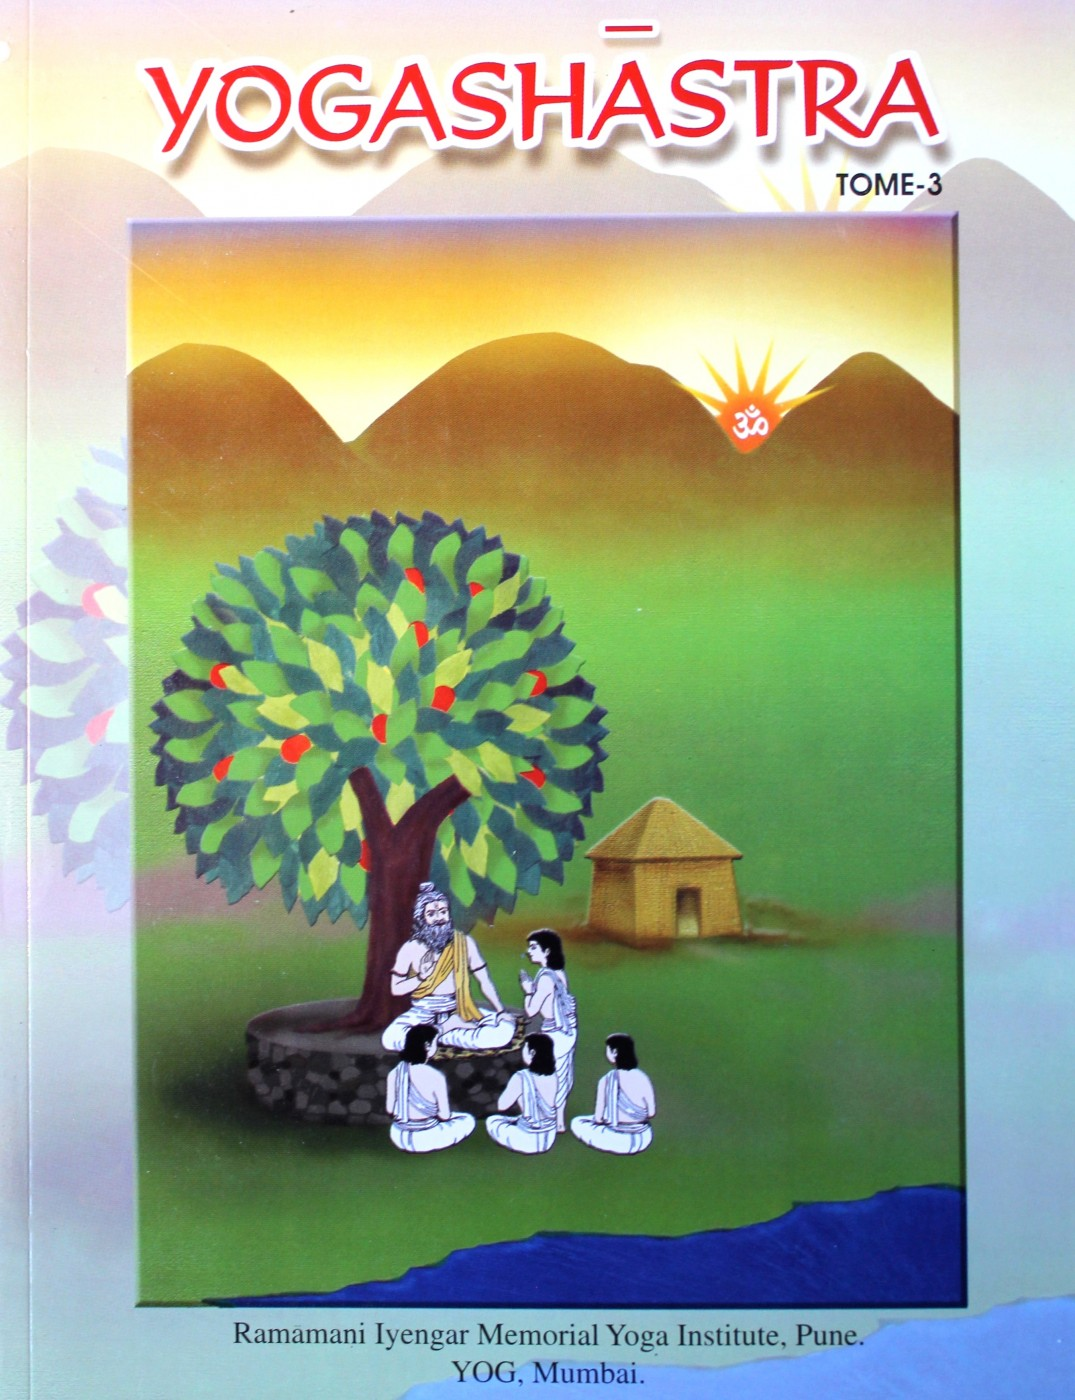 Ramamani Iyengar Memorial Yoga Institute Yogashastra Tome 3